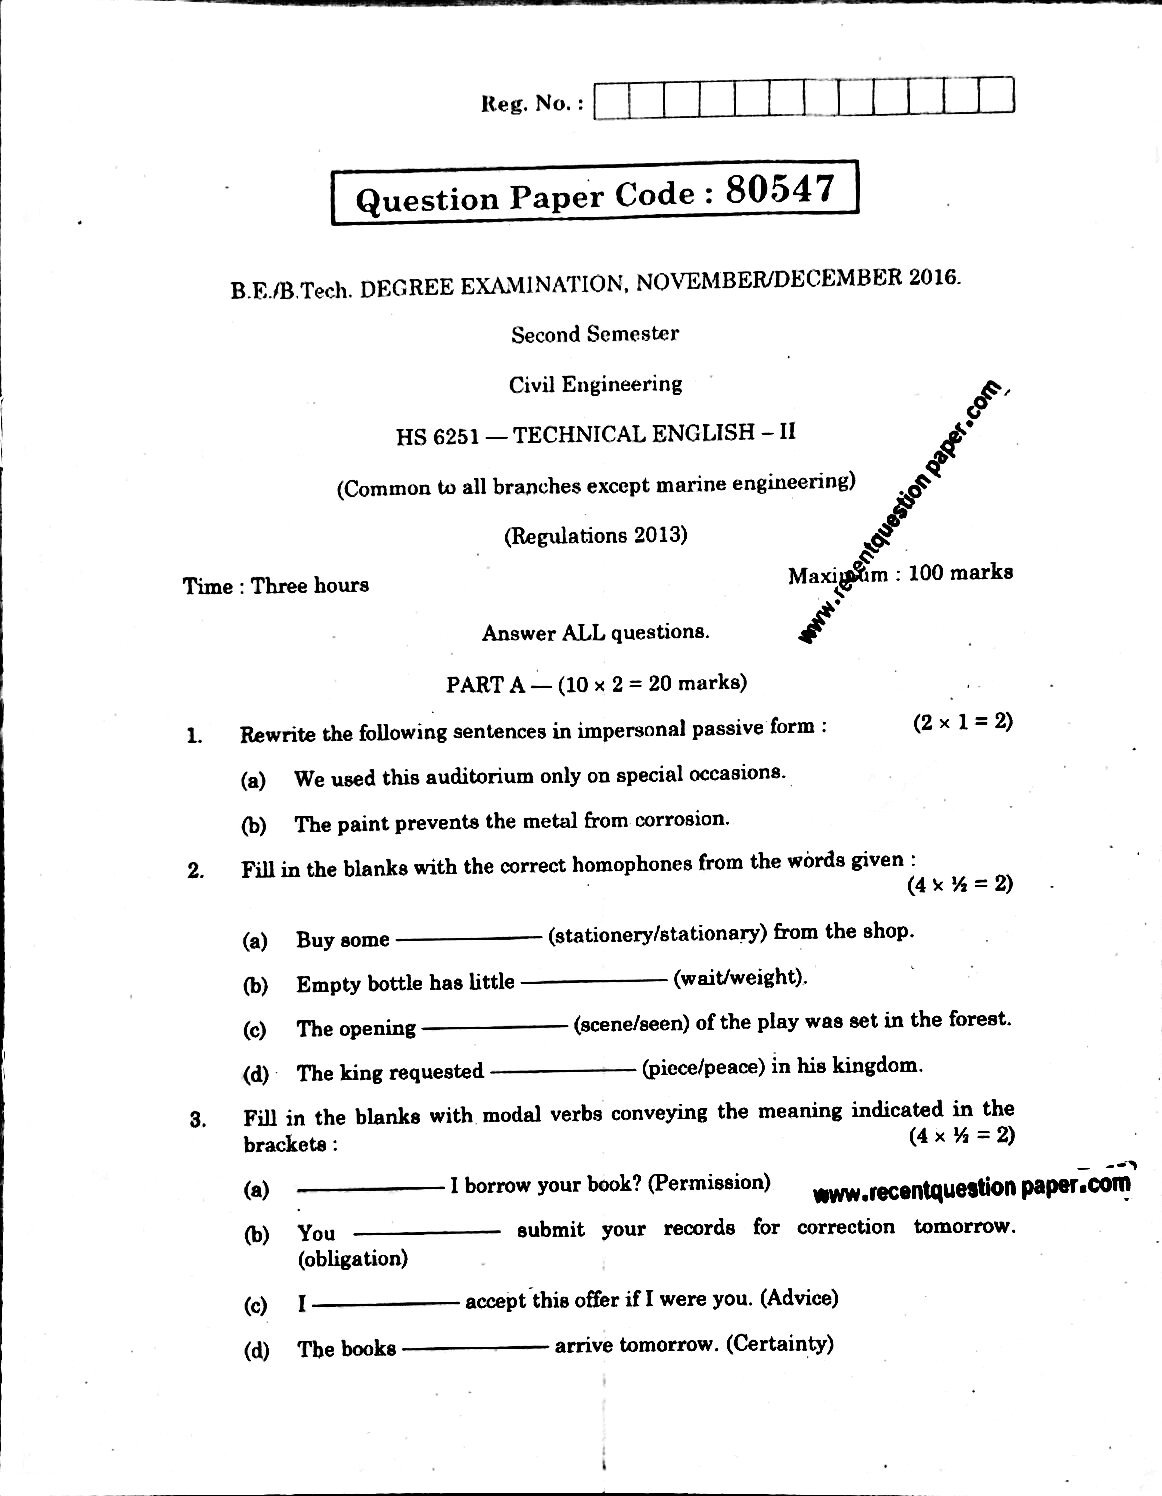 HS6251 Technical English-II Anna University Question paper Nov/Dec 2016